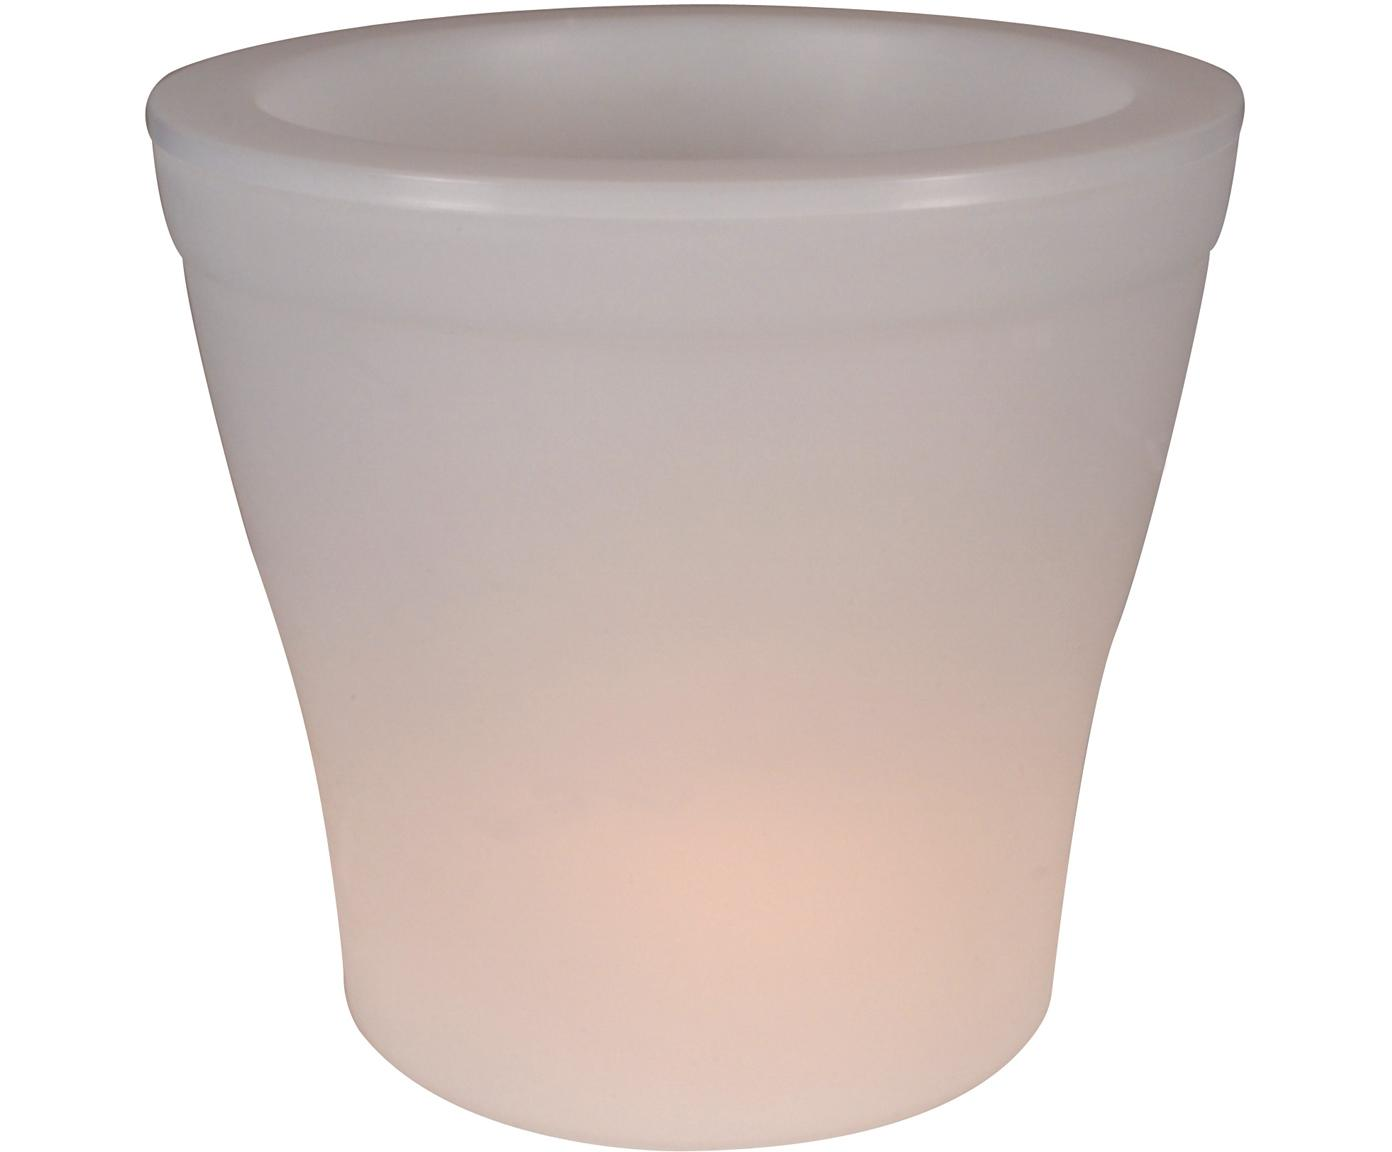 Lámpara móvil para exterior Flowerpot, Plástico, Negro, Ø 39 x Al 37 cm